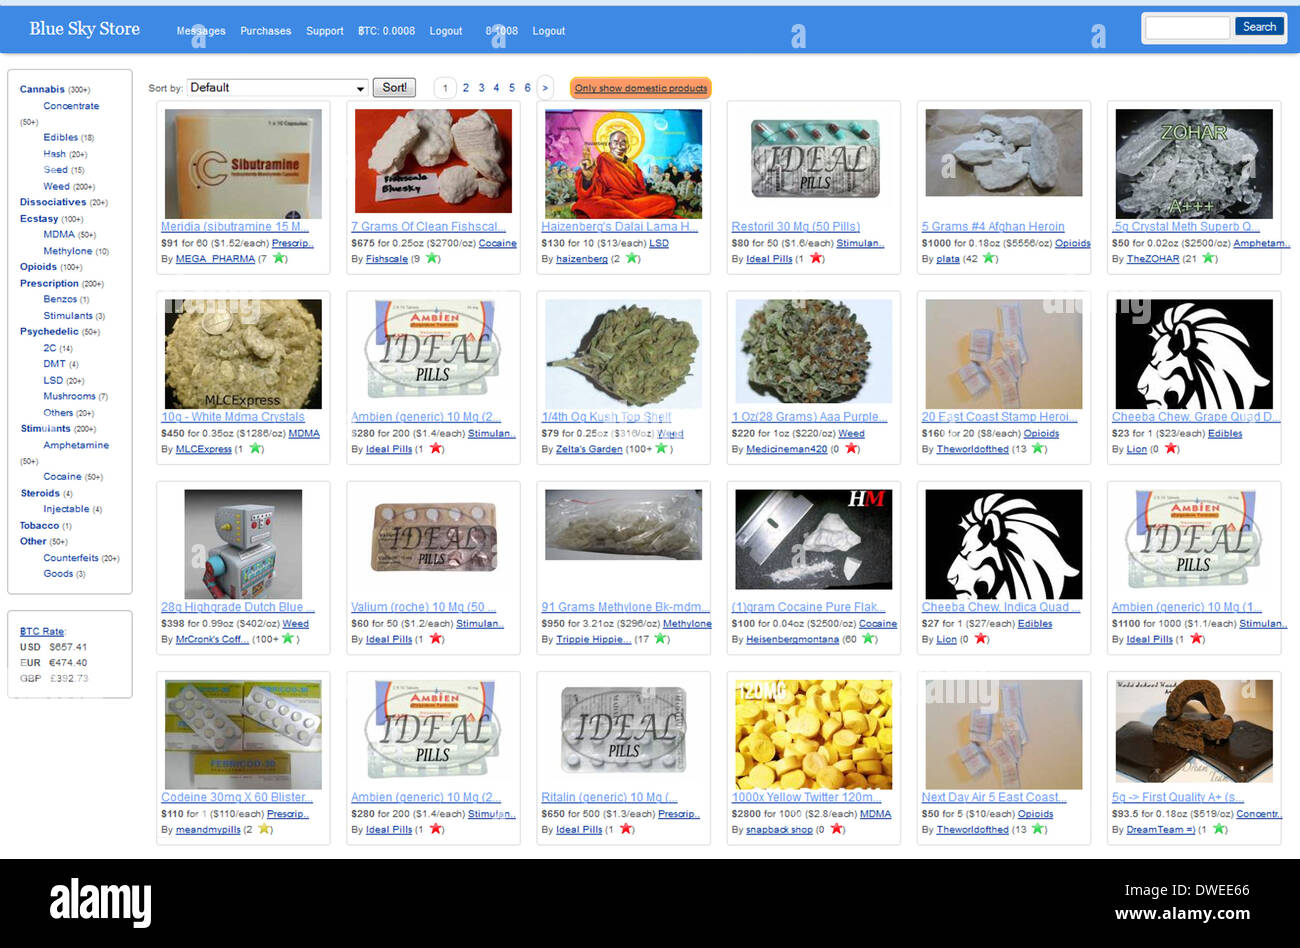 blue sky store online marketplace for illicit goods drugs stock photo 67315982 alamy. Black Bedroom Furniture Sets. Home Design Ideas